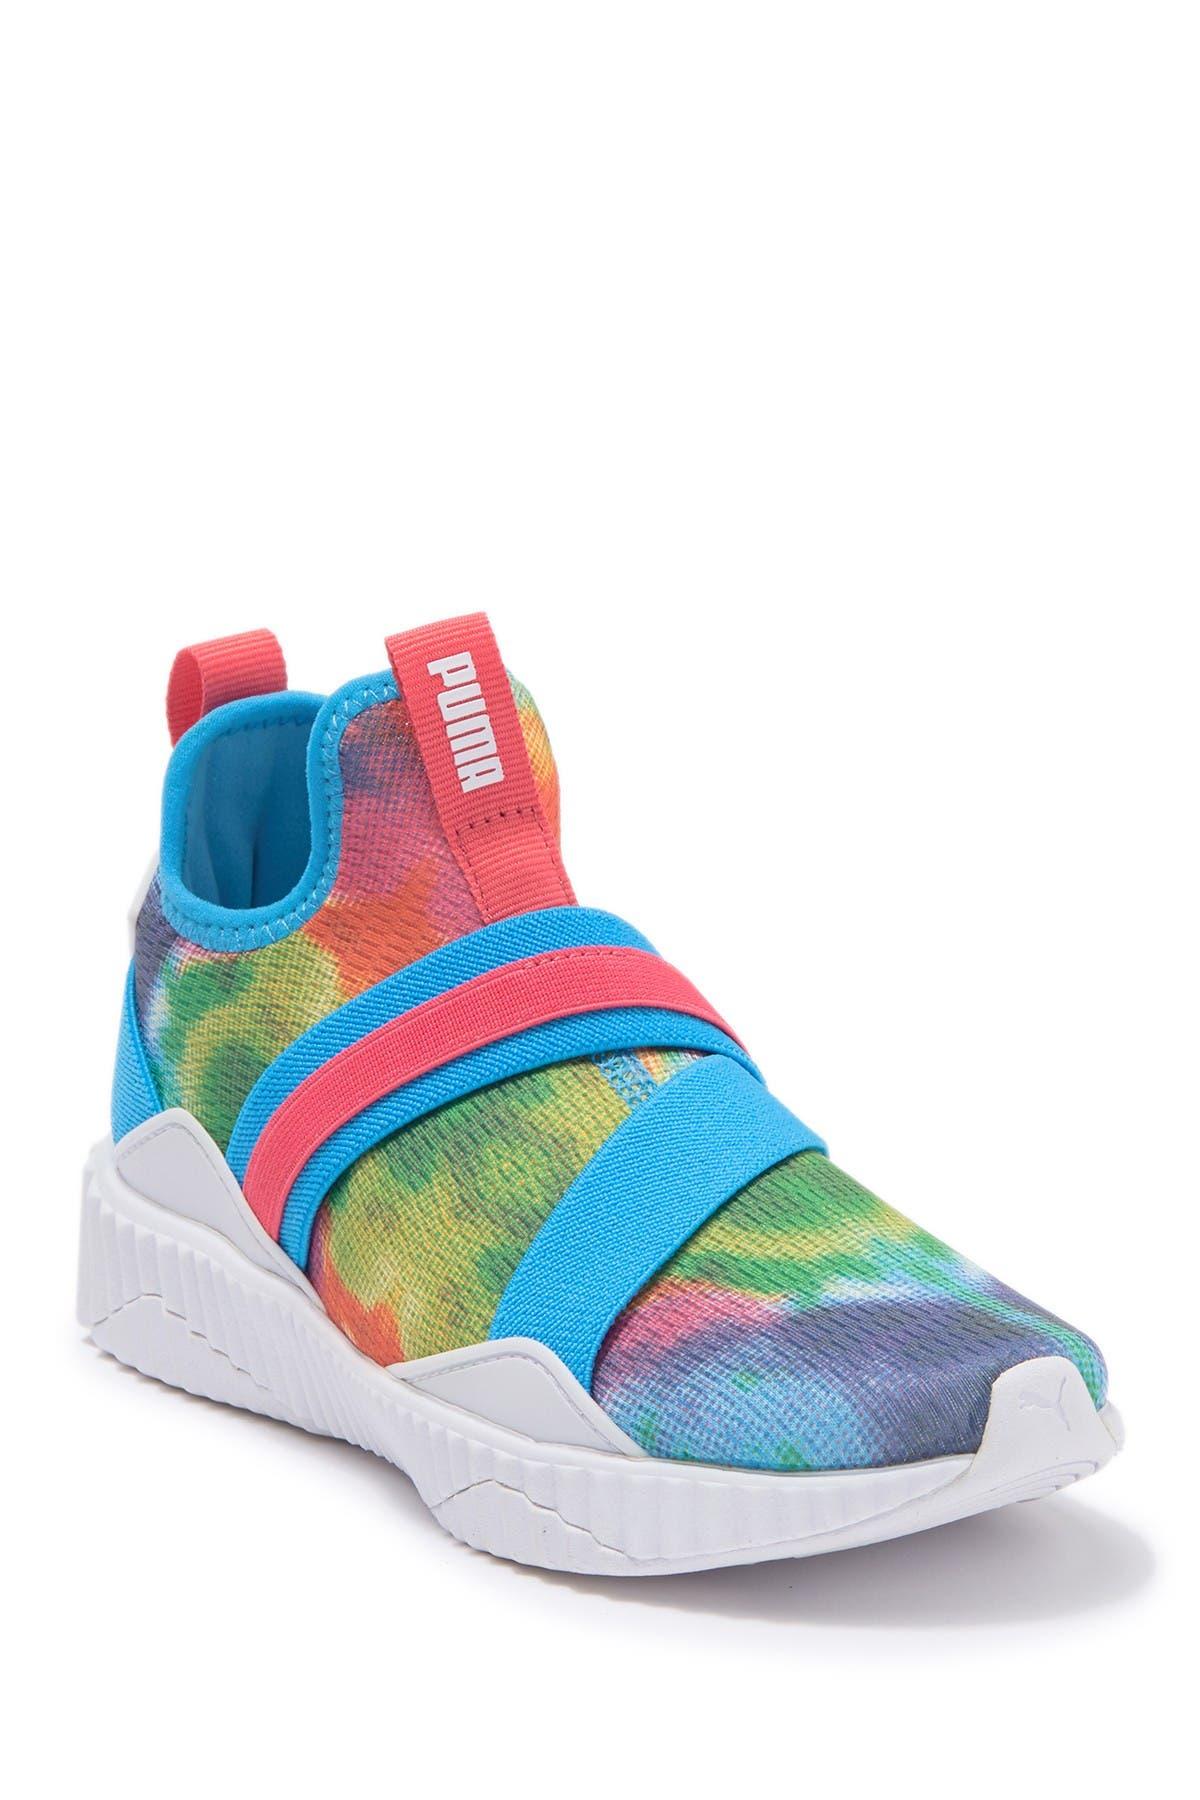 Image of PUMA Defy Mid Sneaker